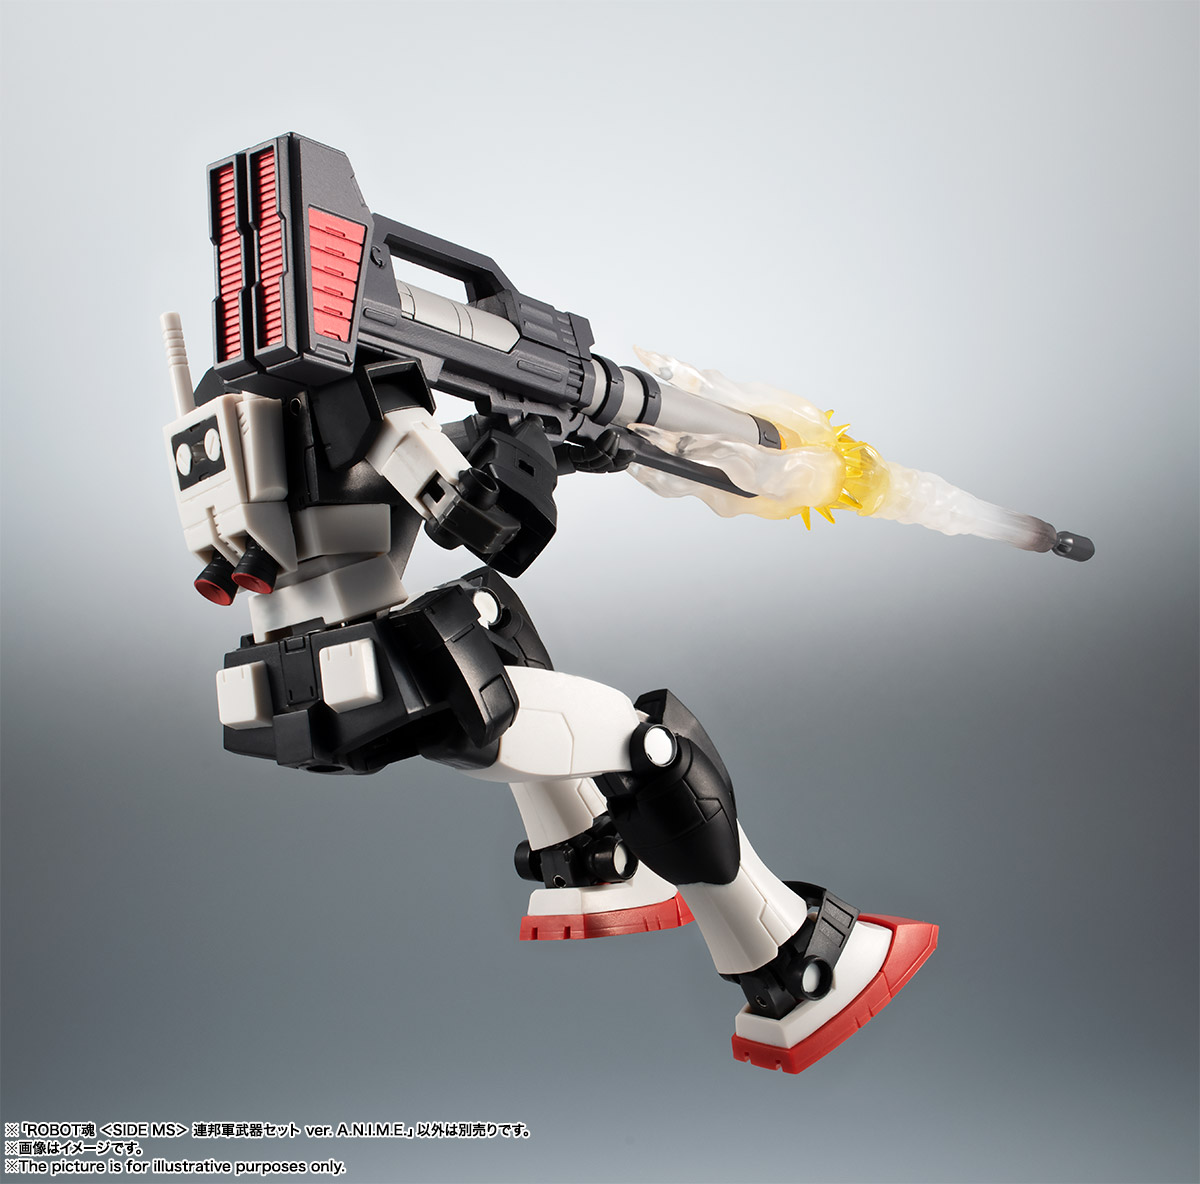 ROBOT魂〈SIDE MS〉『連邦軍武器セット ver. A.N.I.M.E.』ガンダム 完成品フィギュア-009